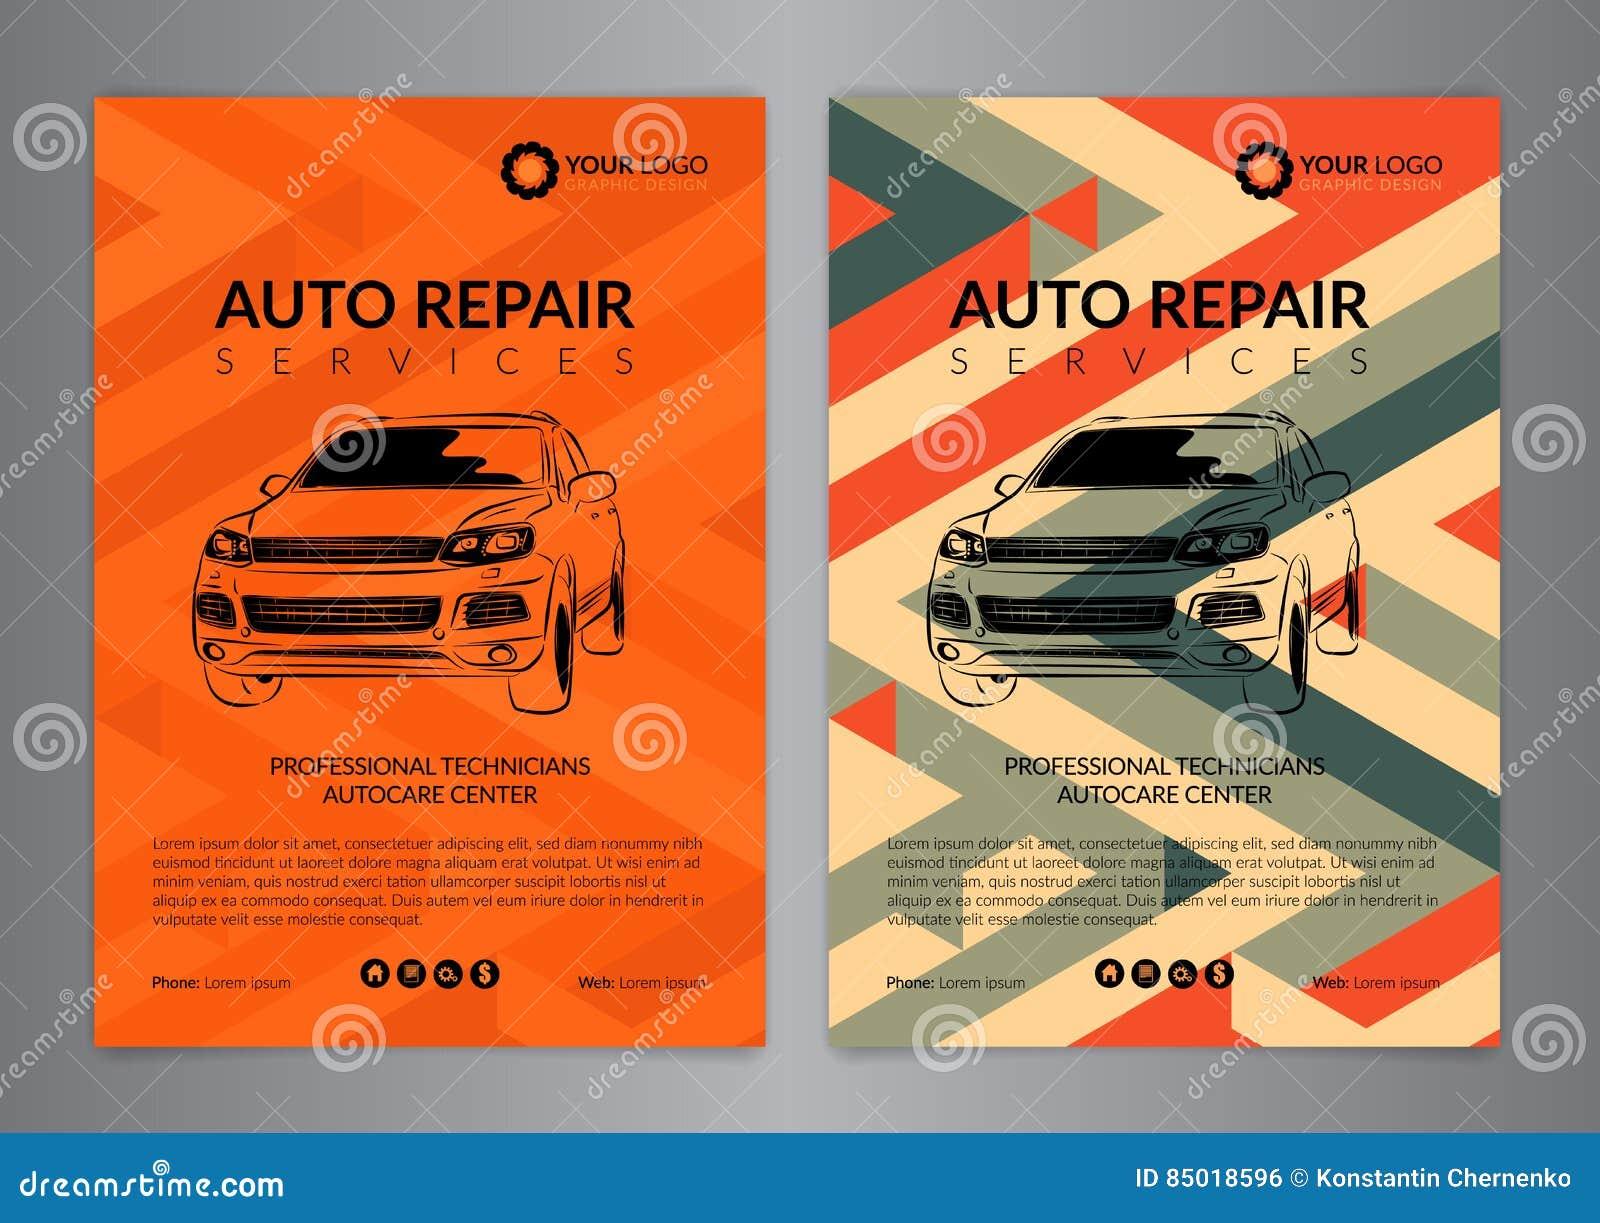 Set Auto Repair Business Layout Templates Automobile Magazine Cover Auto Repair Shop Stock Vector Illustration Of Banner Idea 85018596